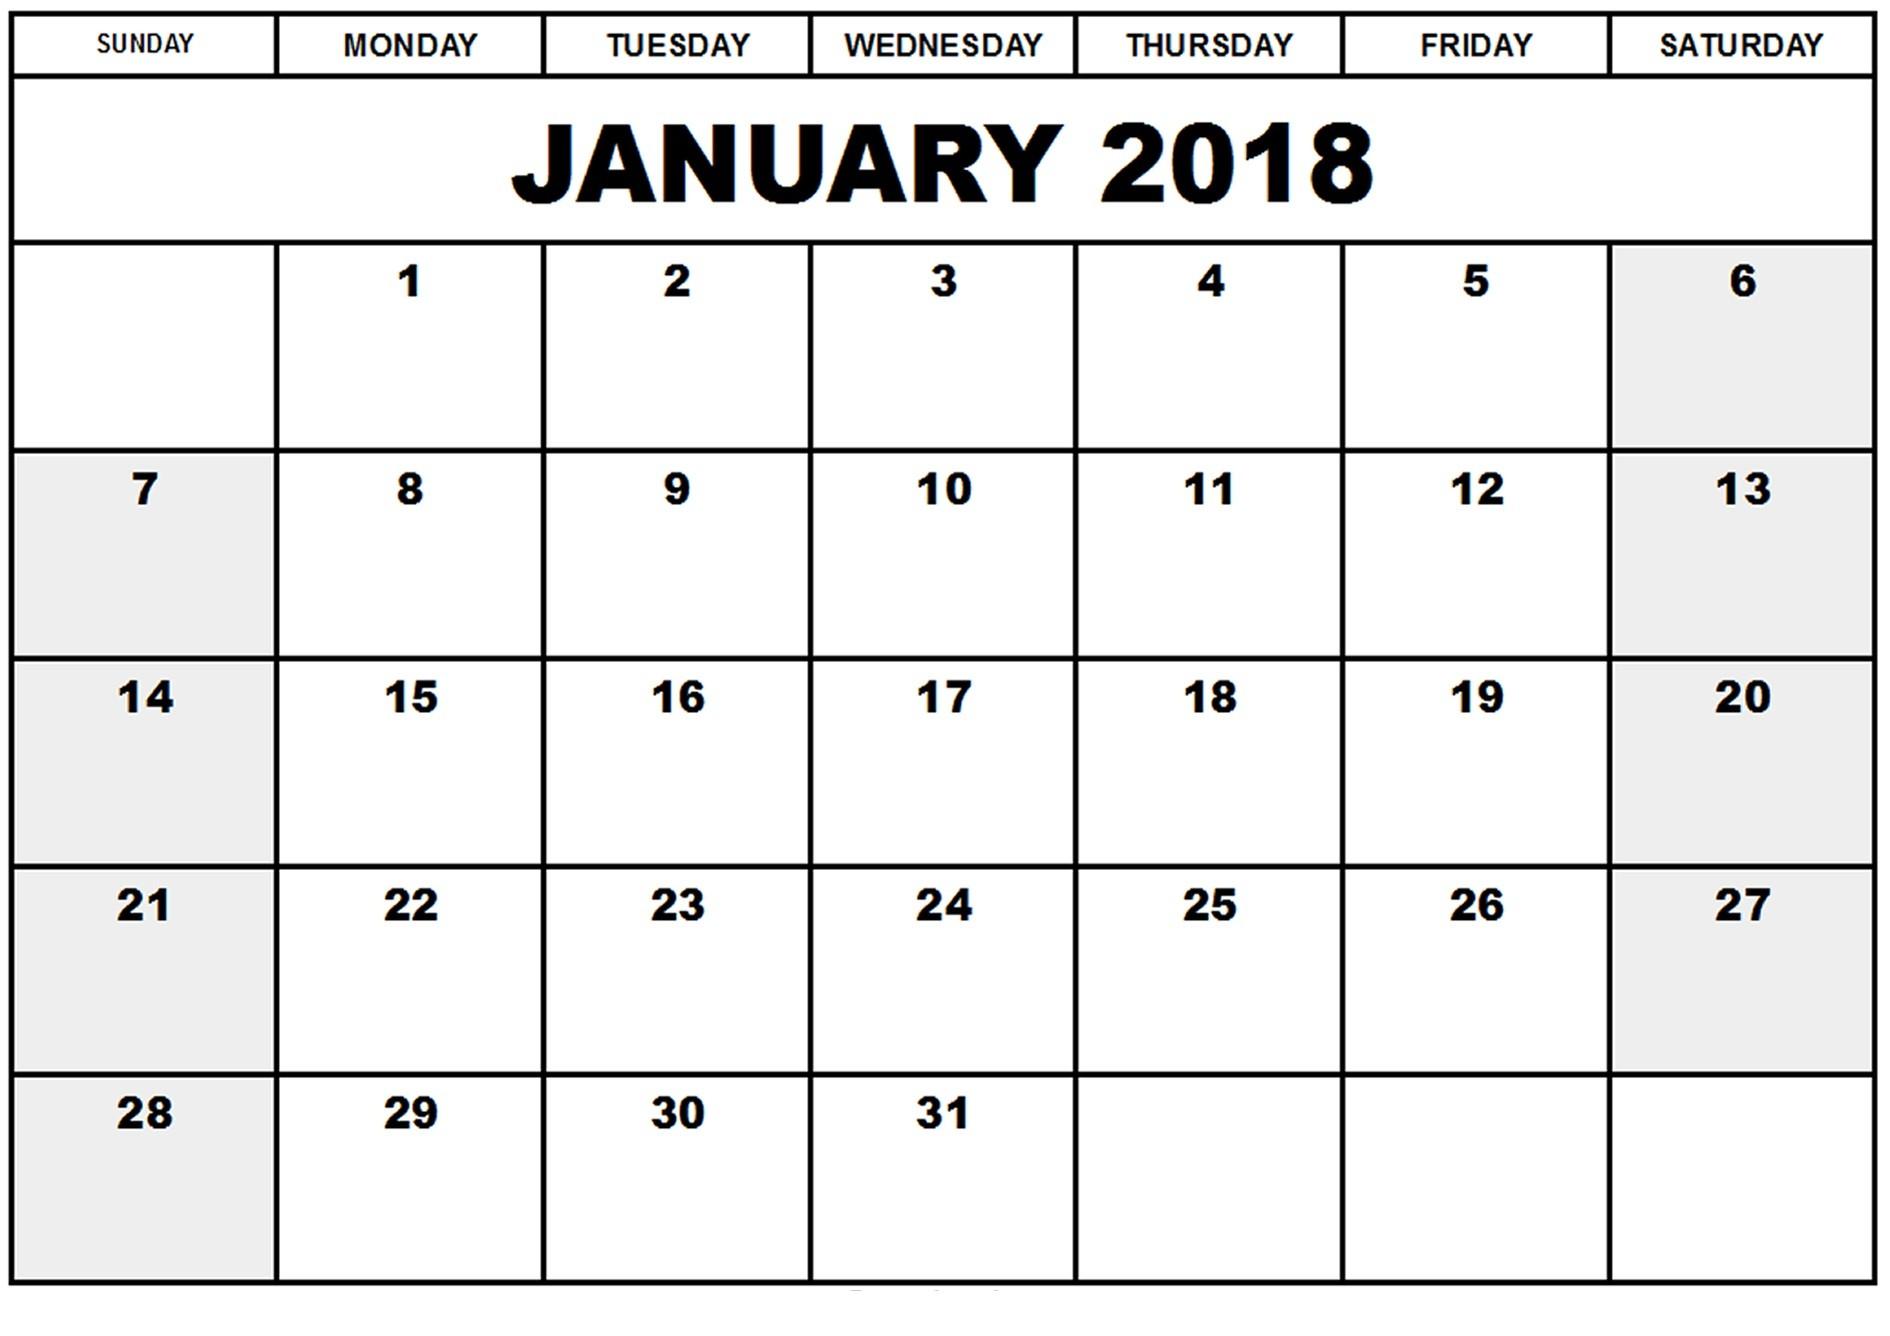 Free January 2018 Printable Calendar